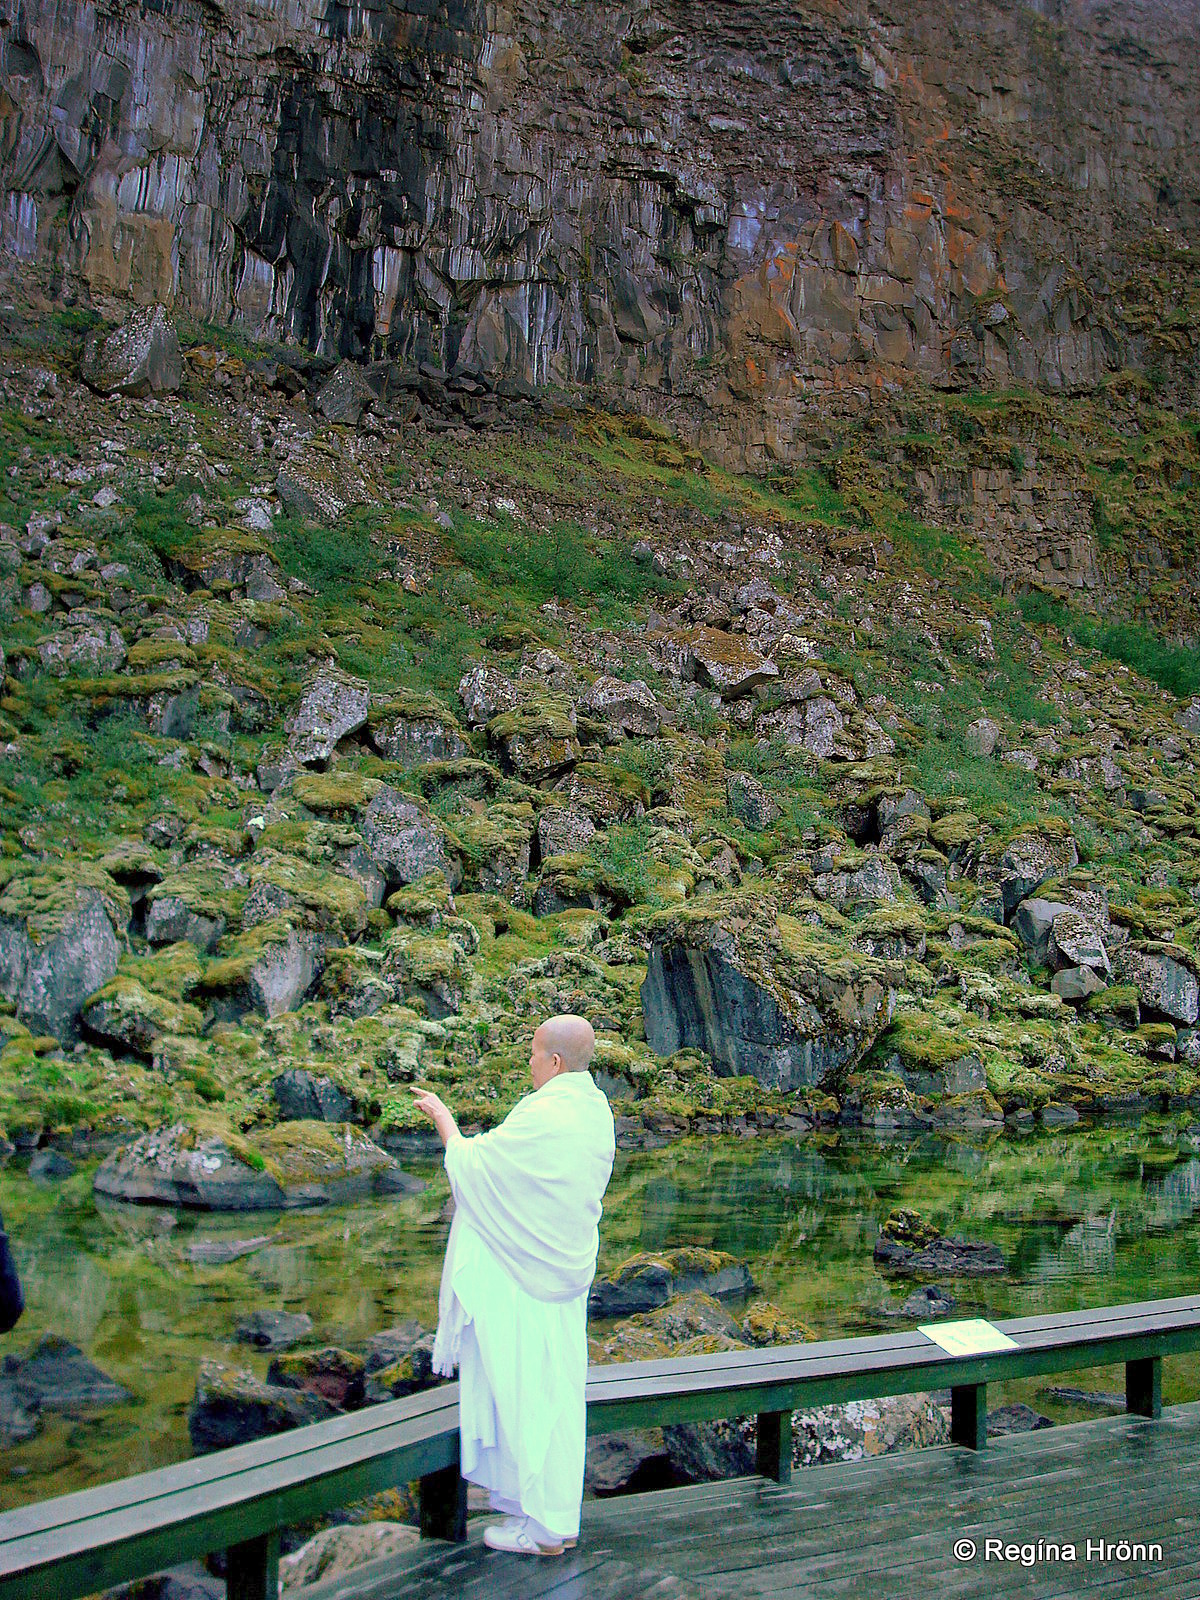 Botnstjörn pond in Ásbyrgi - a monk by the pond